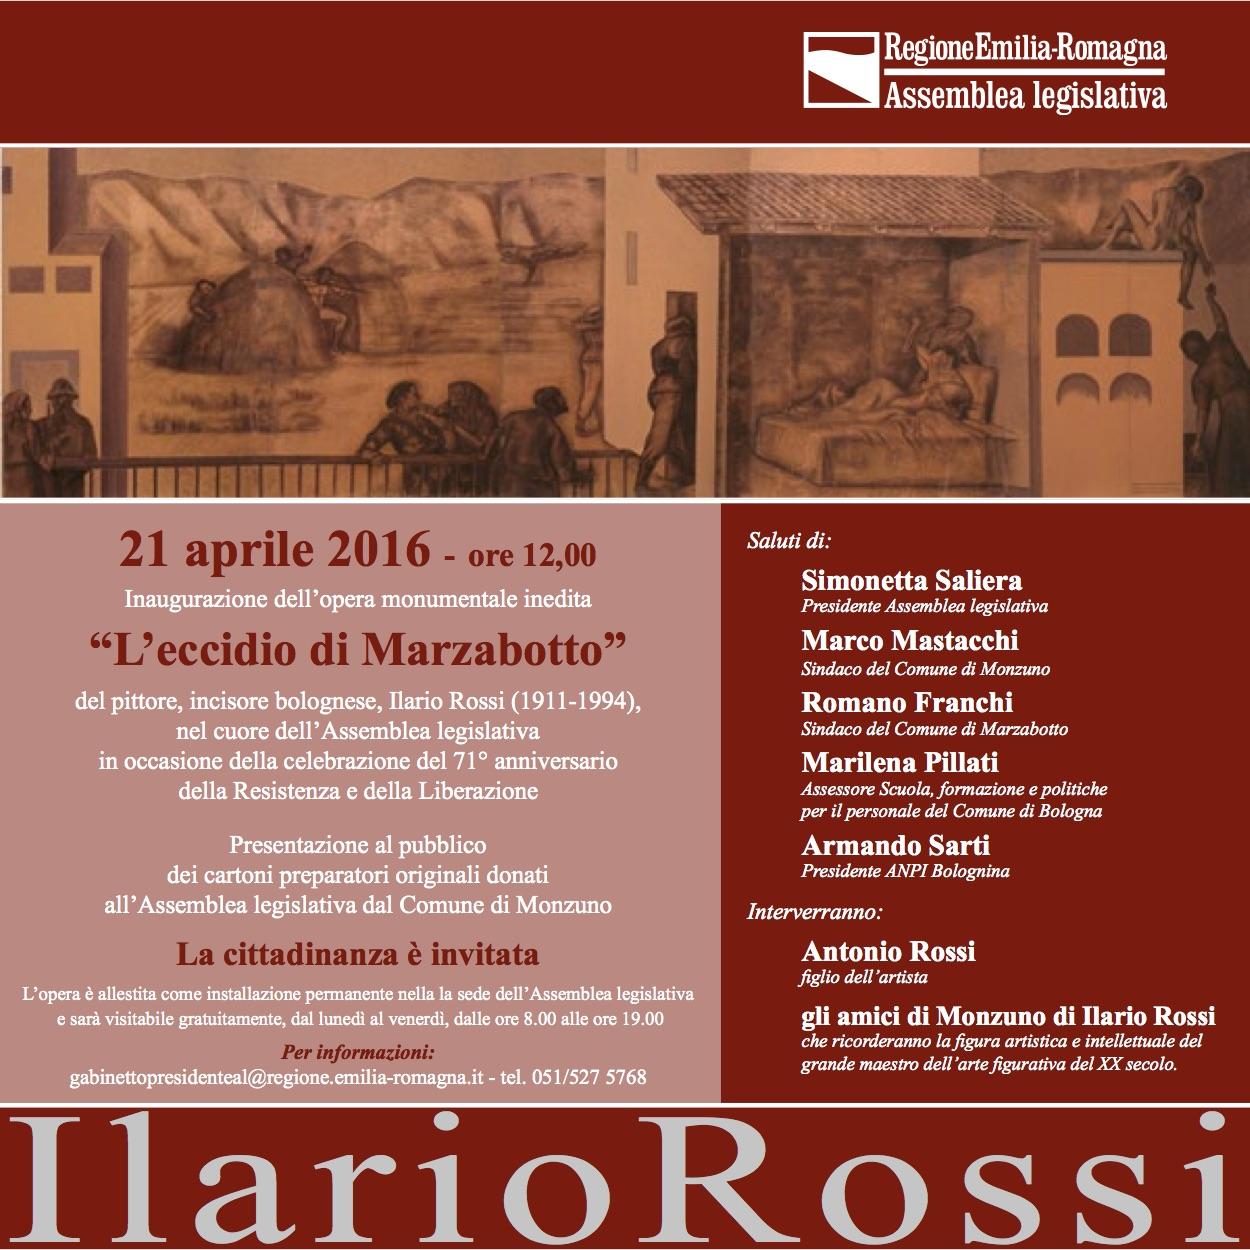 Ilario Rossi, Regione Emilia Romagna, mostra, Marzabotto